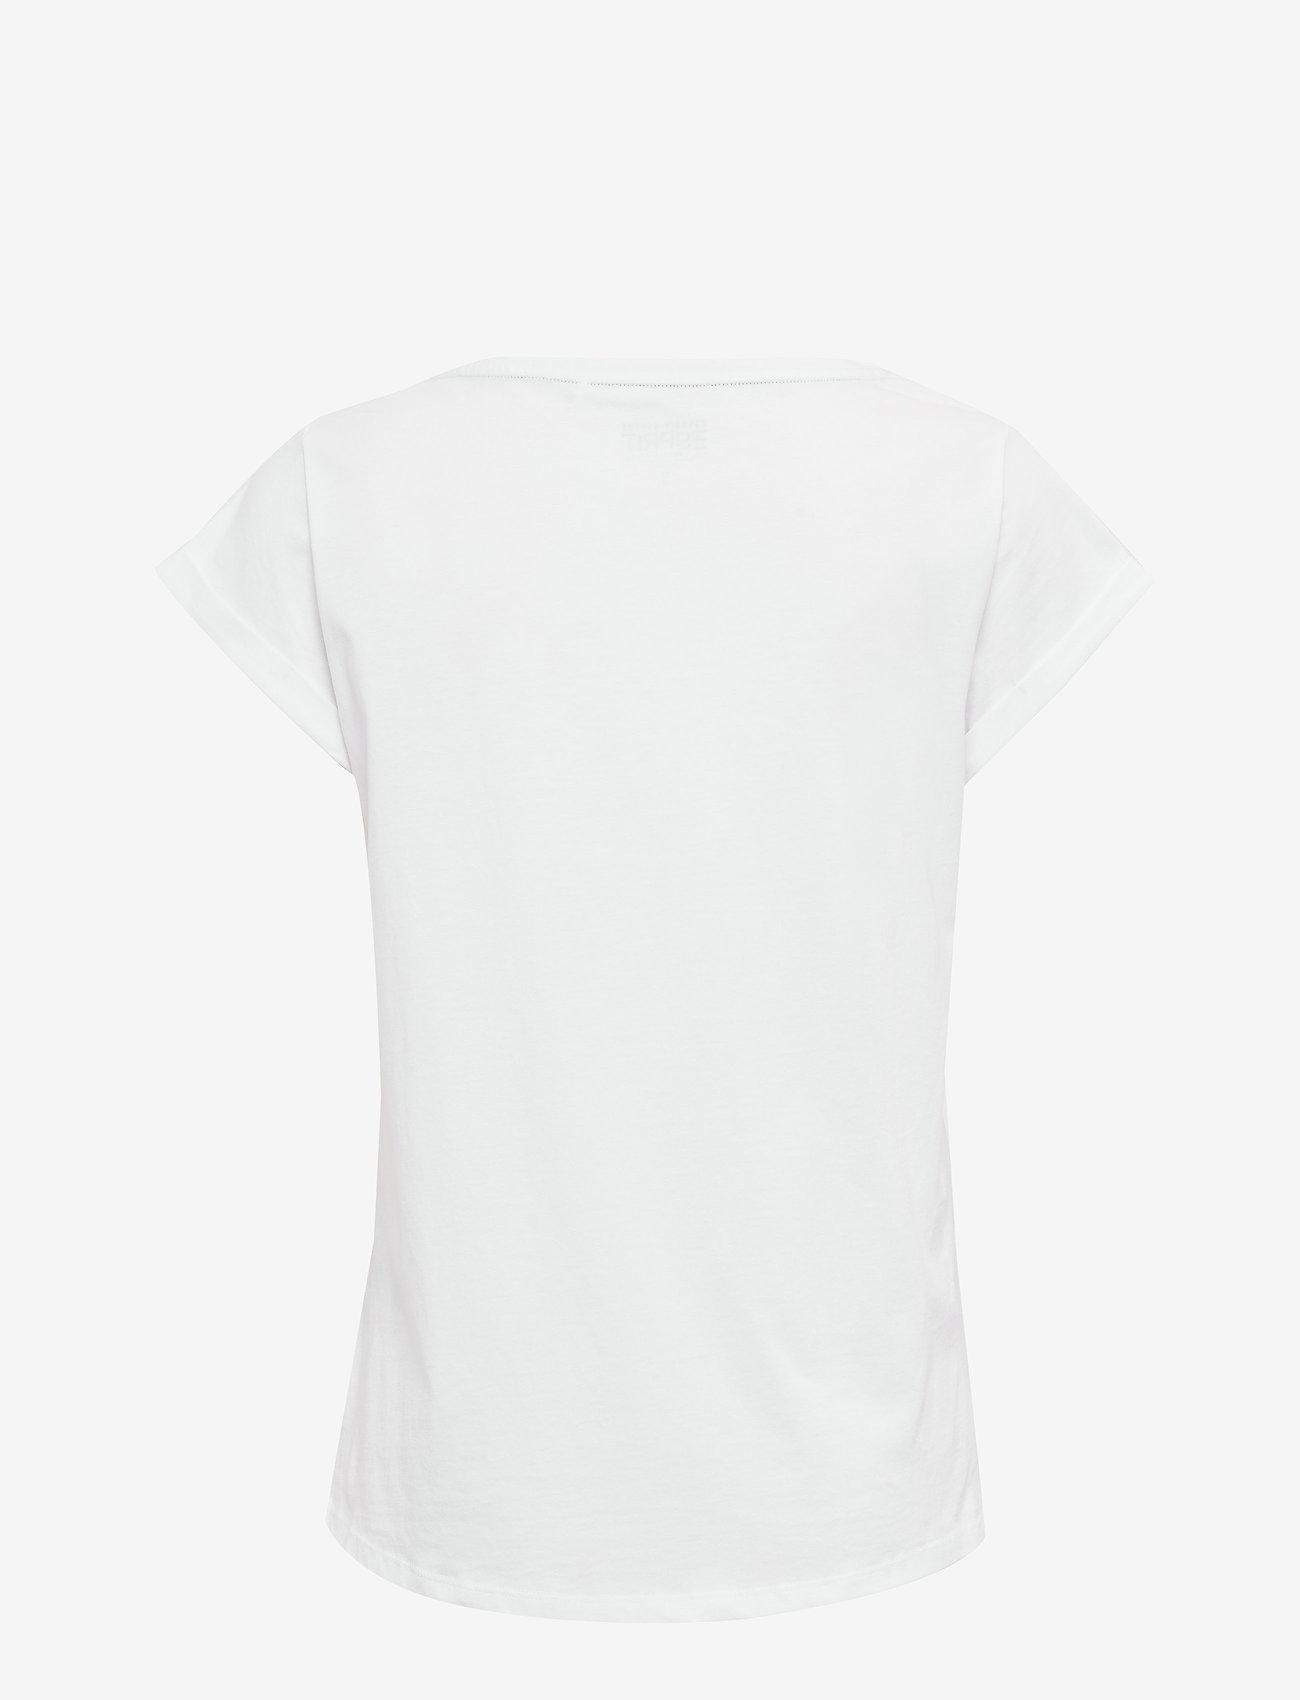 Esprit Casual - T-Shirts - t-shirts - white 2 - 1